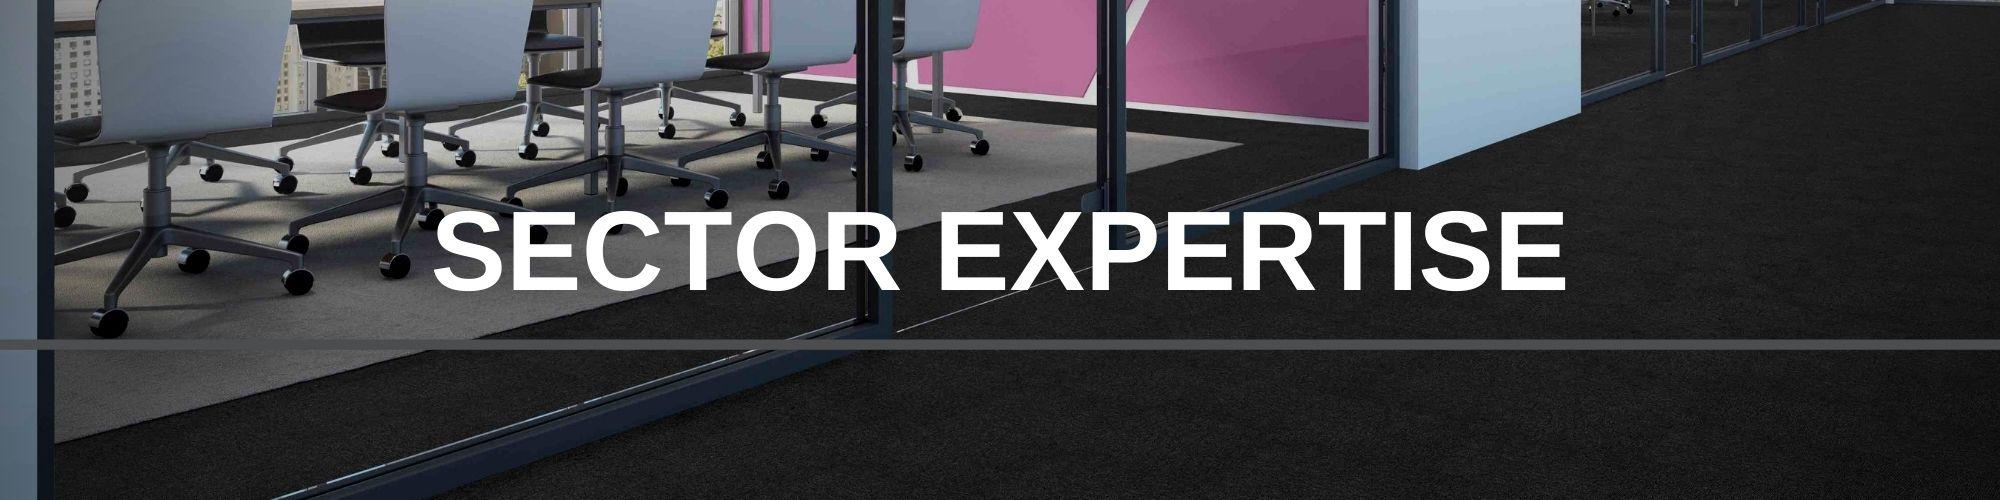 SECTOR EXPERTISE | Paragon Carpet Tiles | Commercial Carpet Tiles